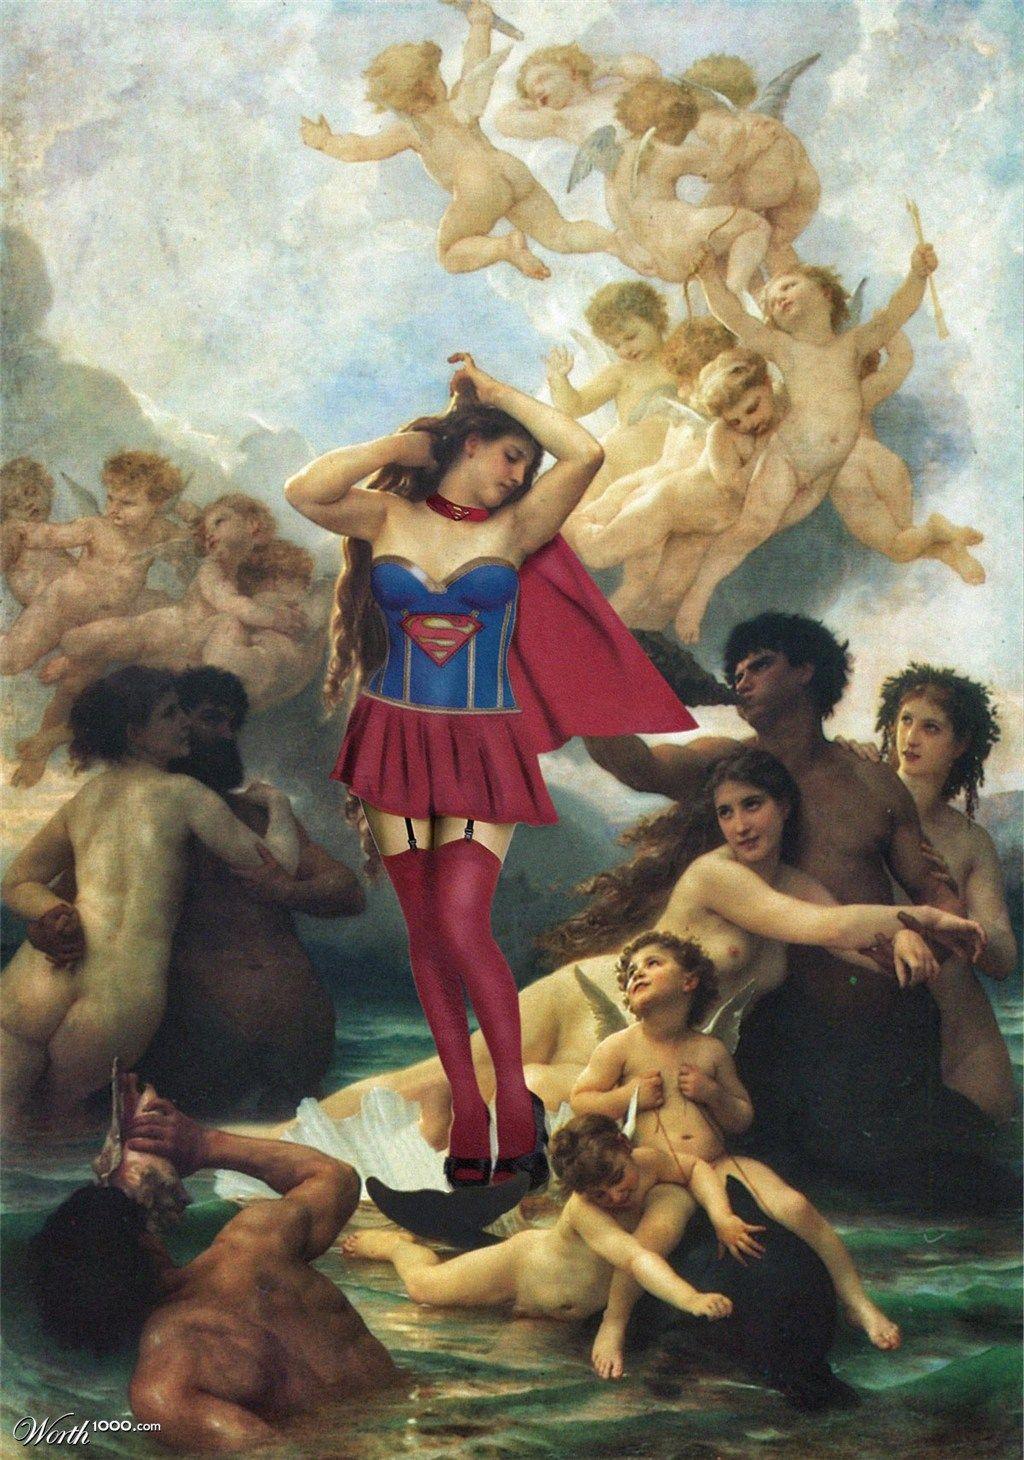 Birth of Venus on Behance